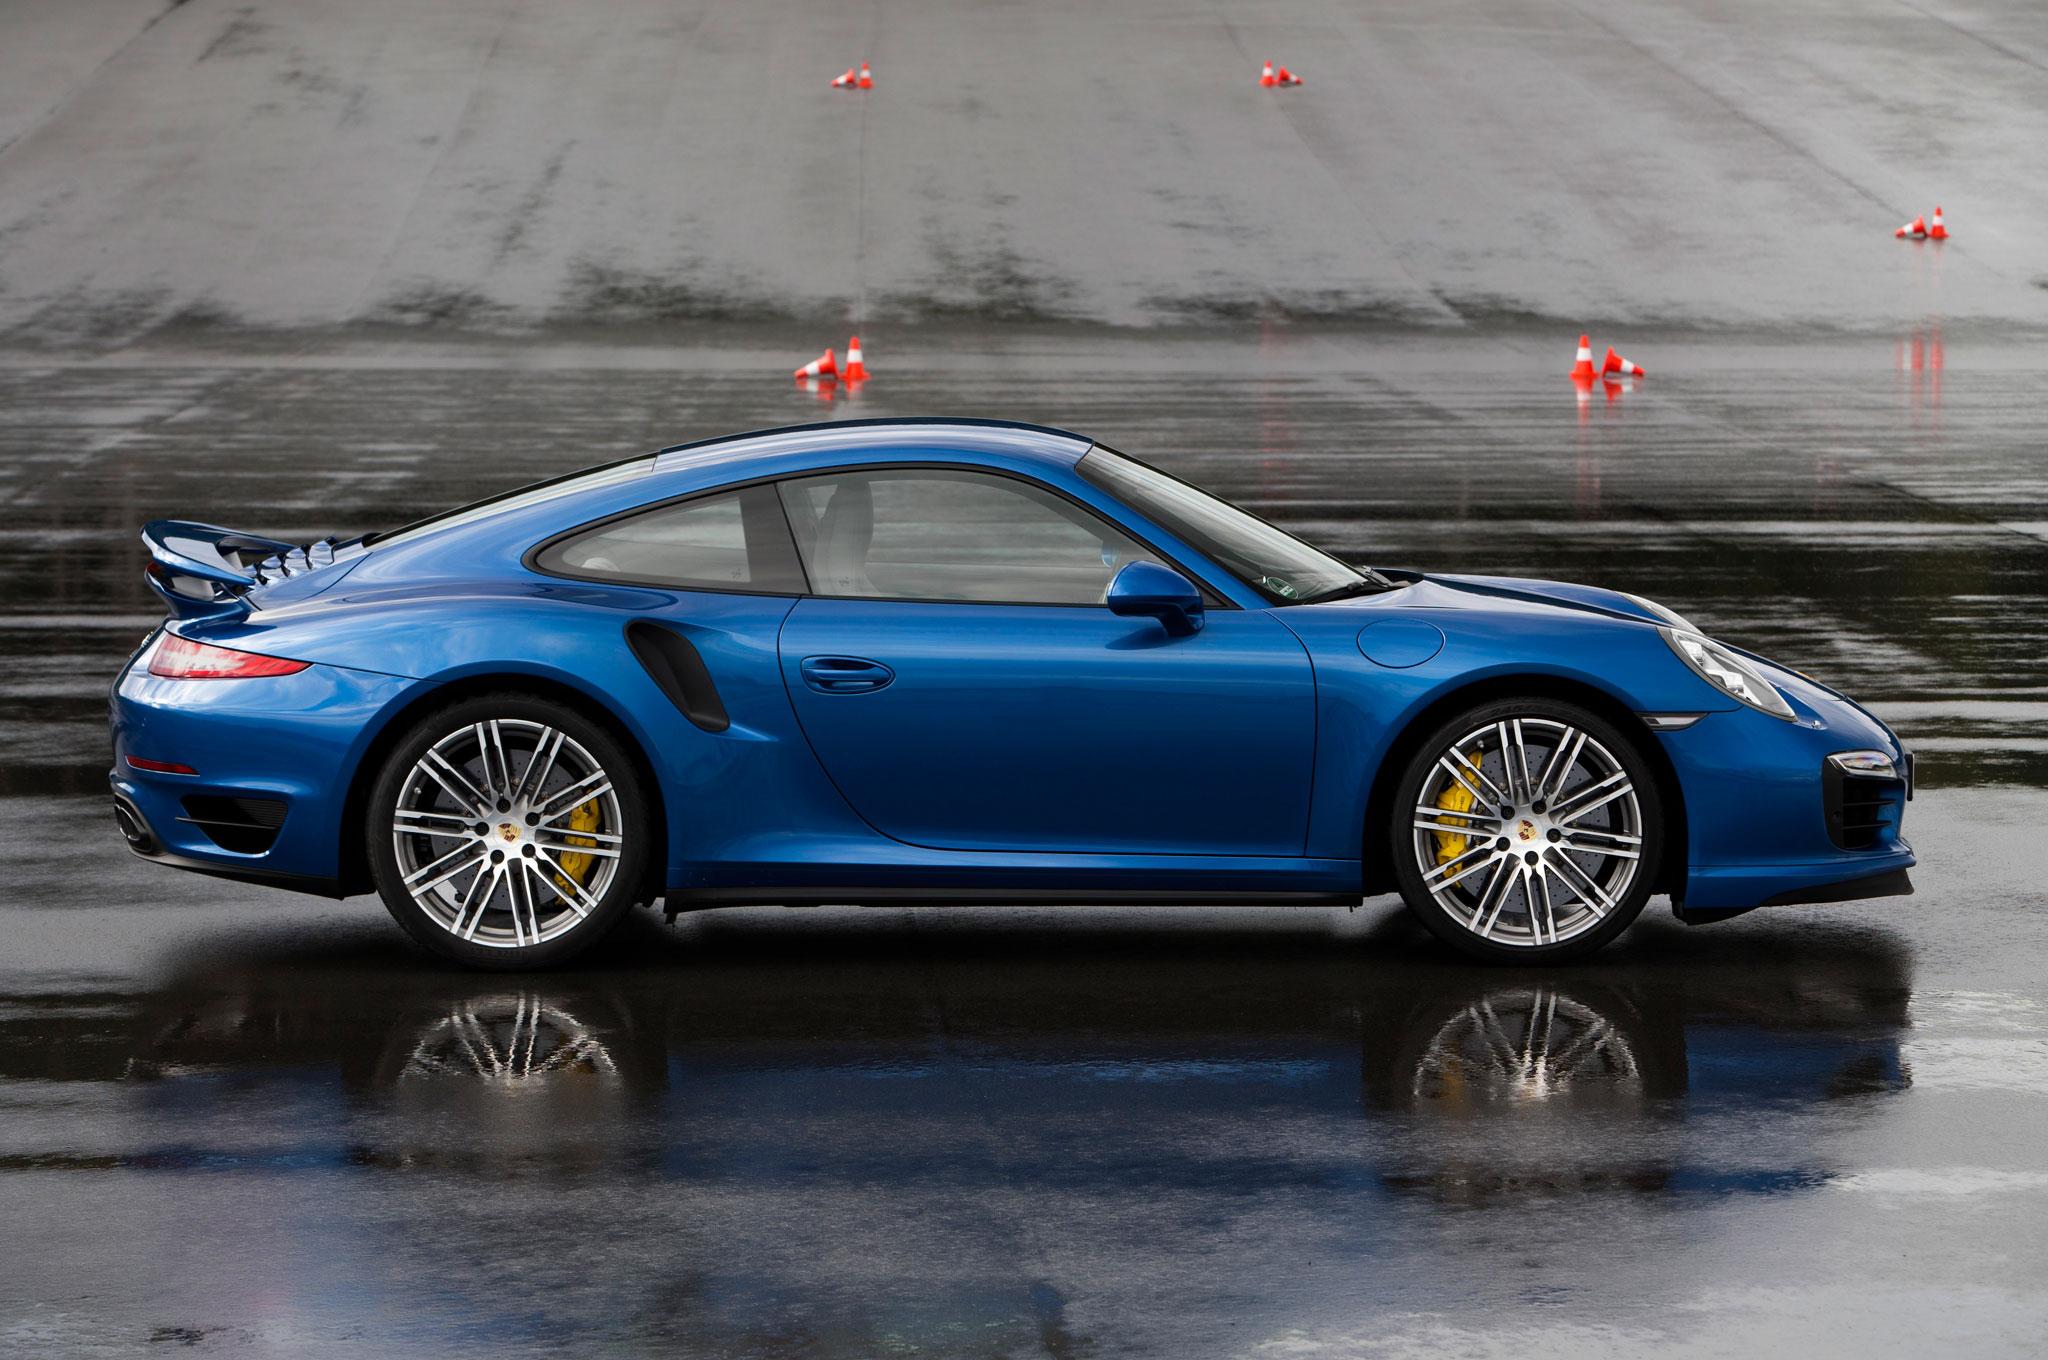 2014 porsche 911 turbo s right side view - 911 Porsche 2014